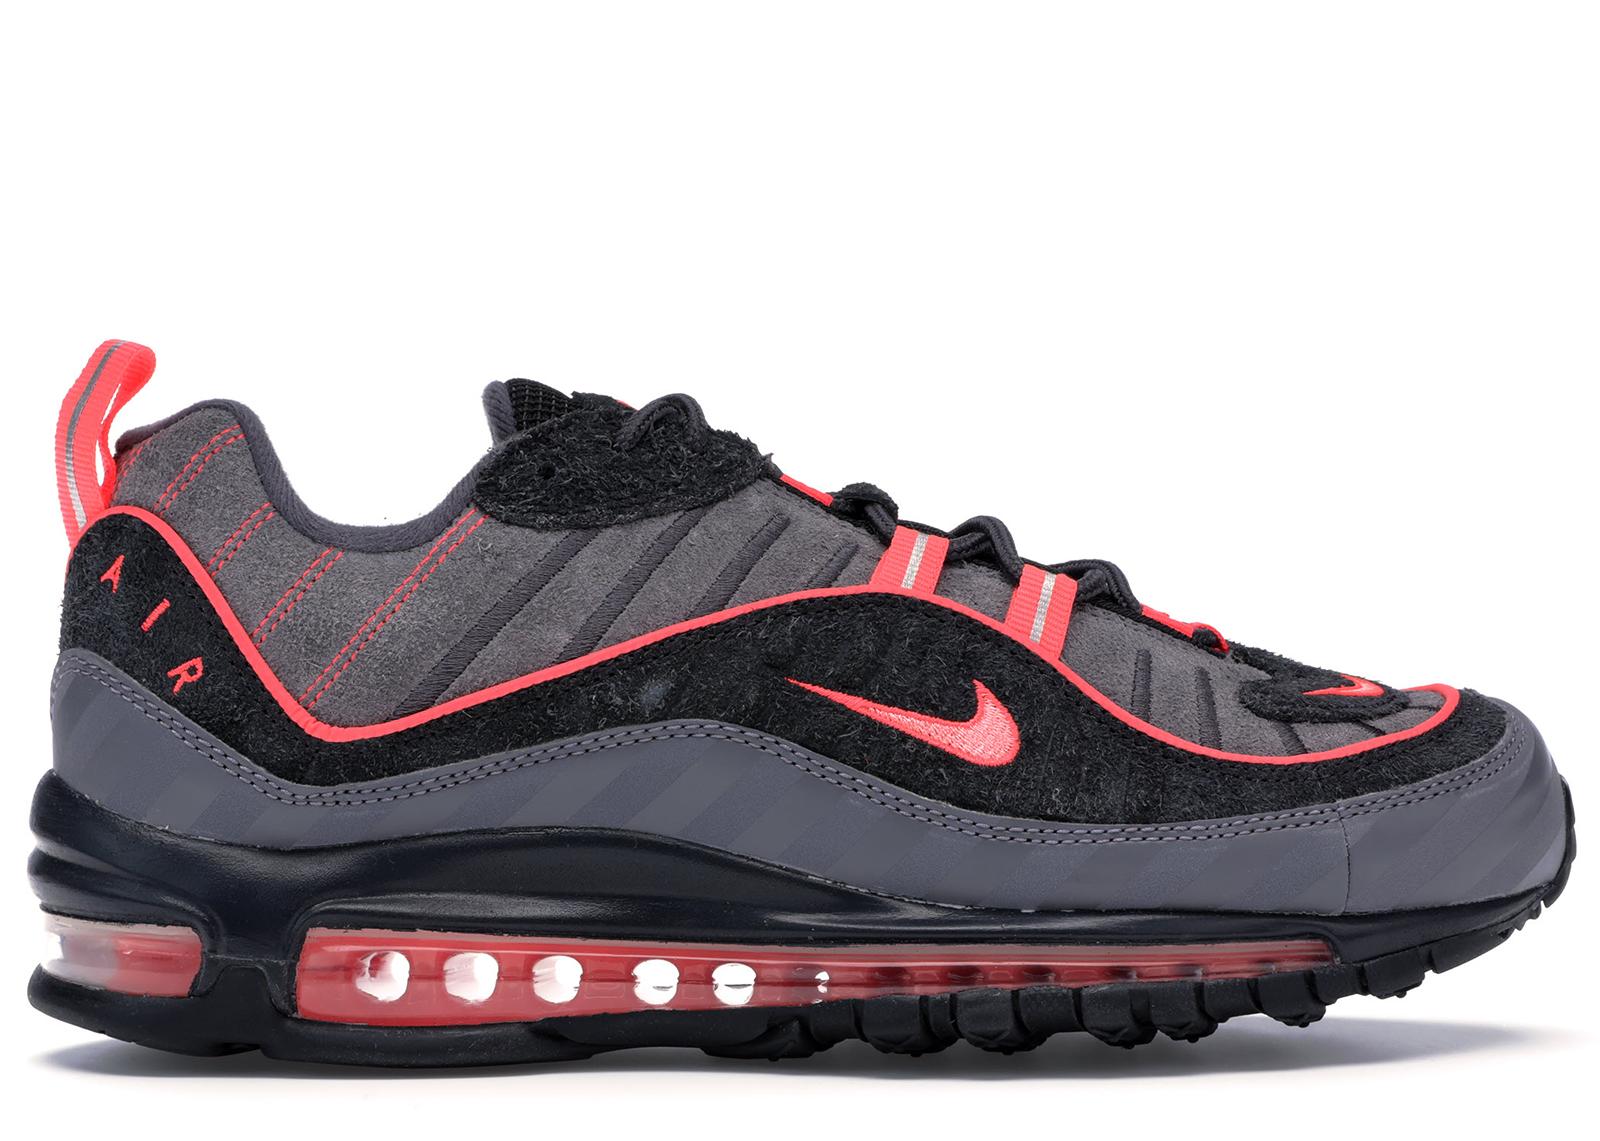 Nike Air Max 98 Mens Bv6046 001 Size 13